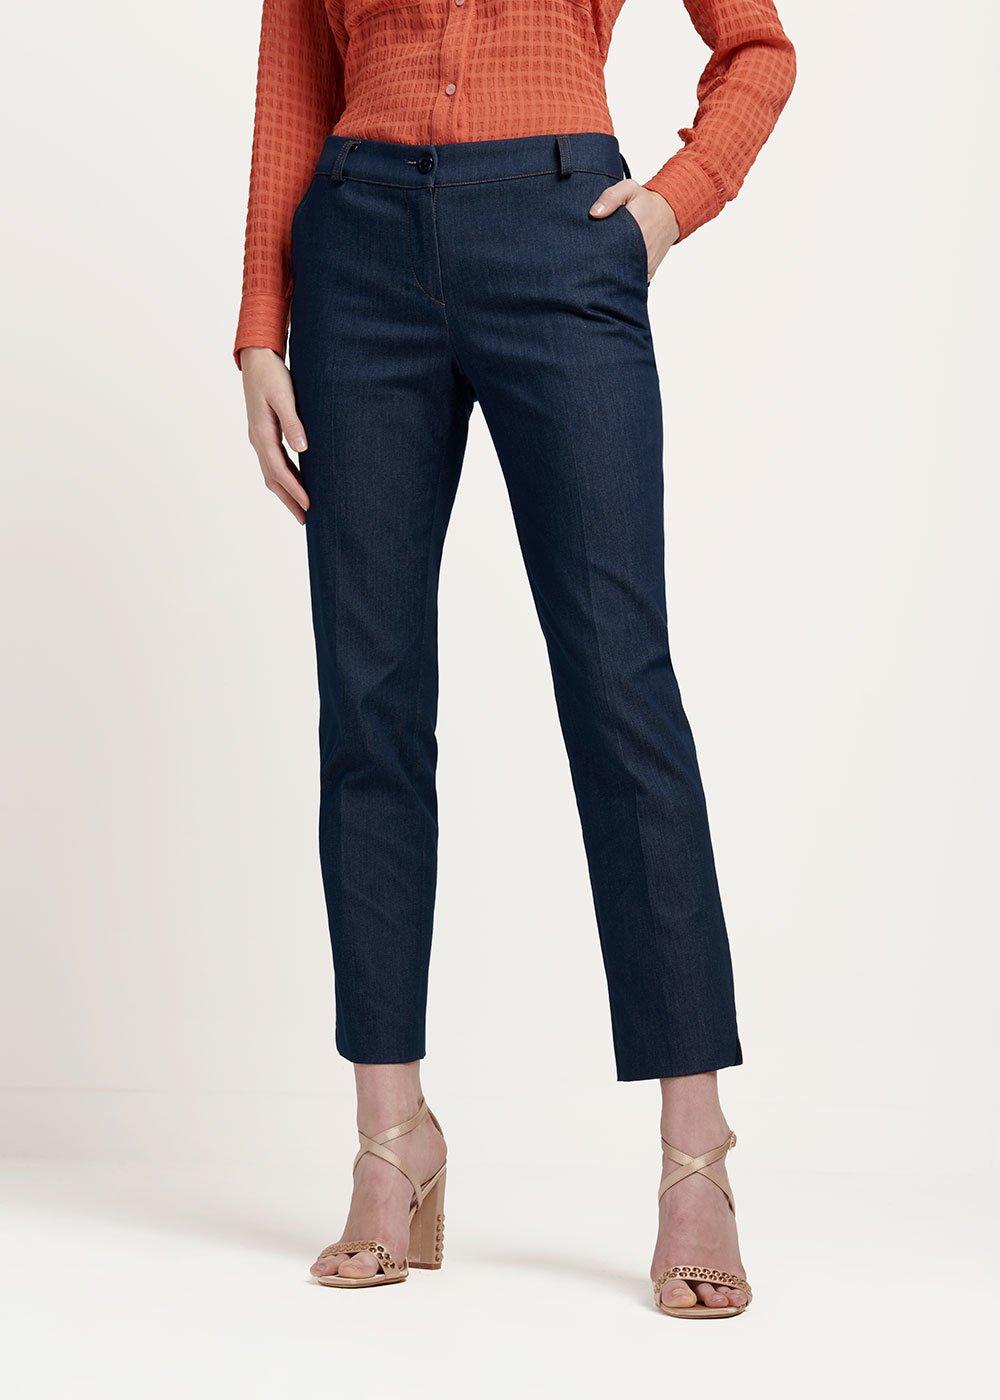 Alice trousers with denim effect - Dark Denim - Woman